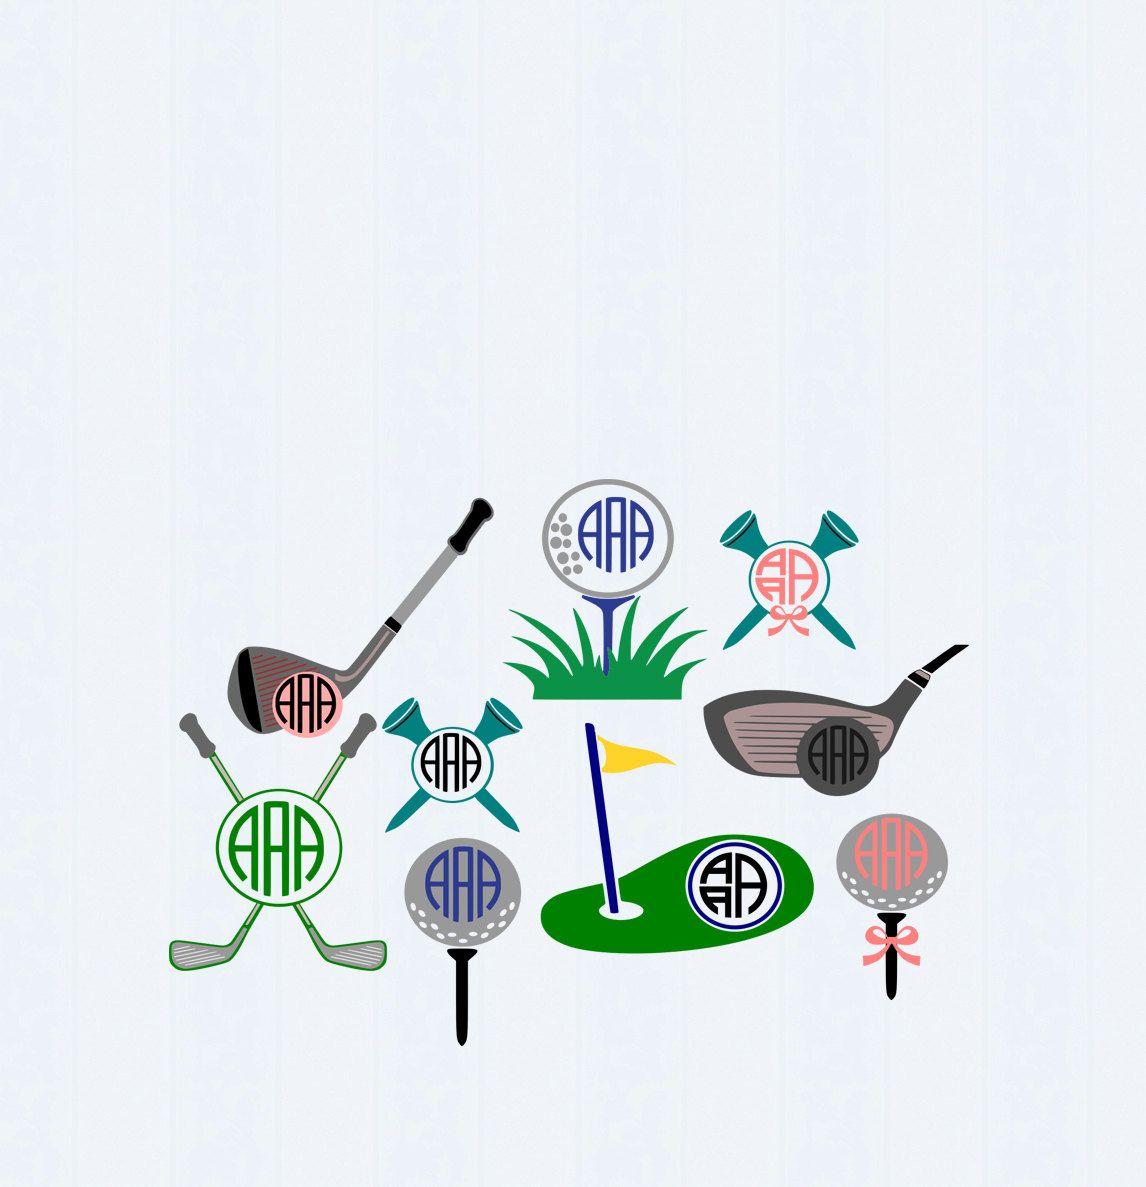 Download Golf SVG Monogram Golf ball svg, Putter svg, Golf tee svg ...